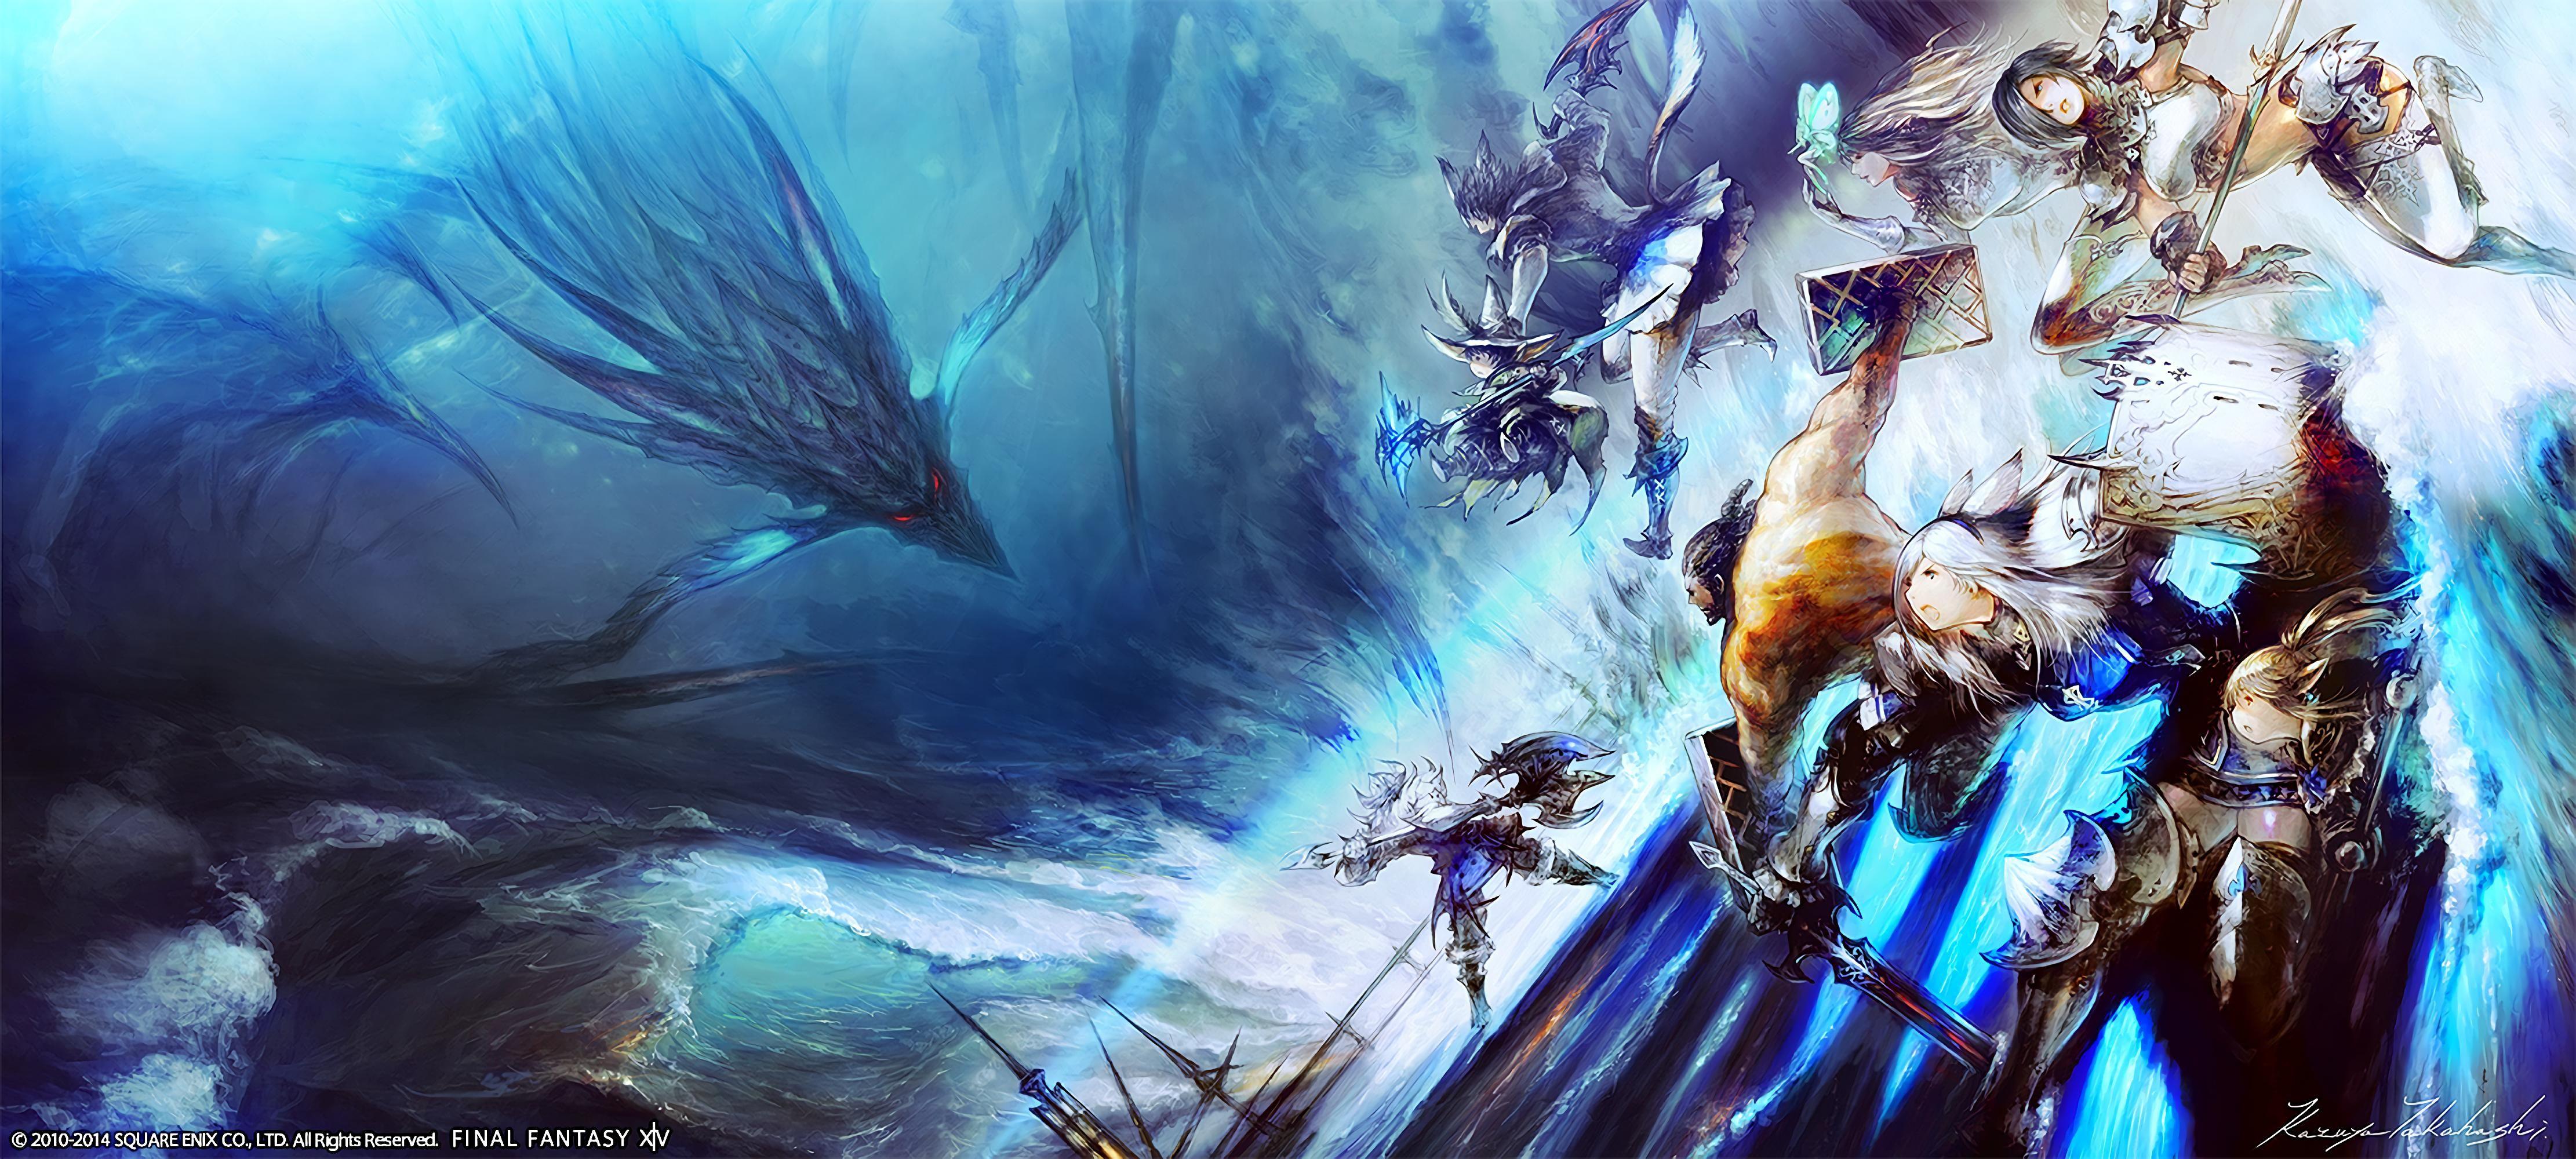 Ffxiv 4k Wallpaper Album Album On Imgur Final Fantasy Xiv Final Fantasy Fantasy